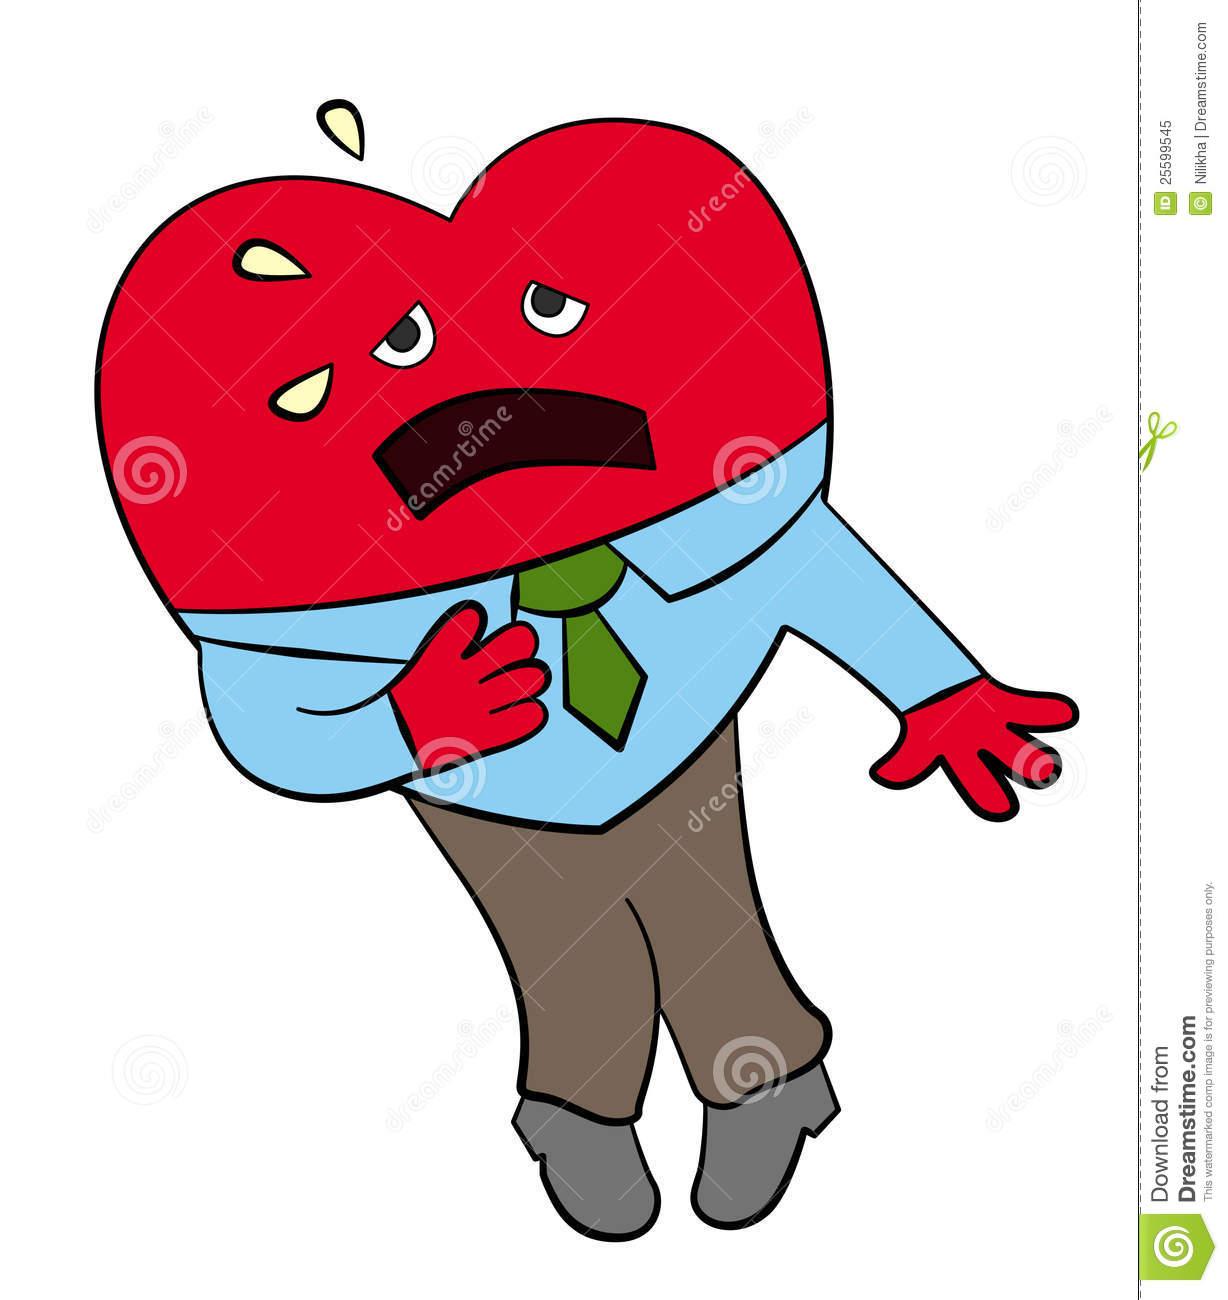 Man Having A Heart Attack .-Man Having A Heart Attack .-15